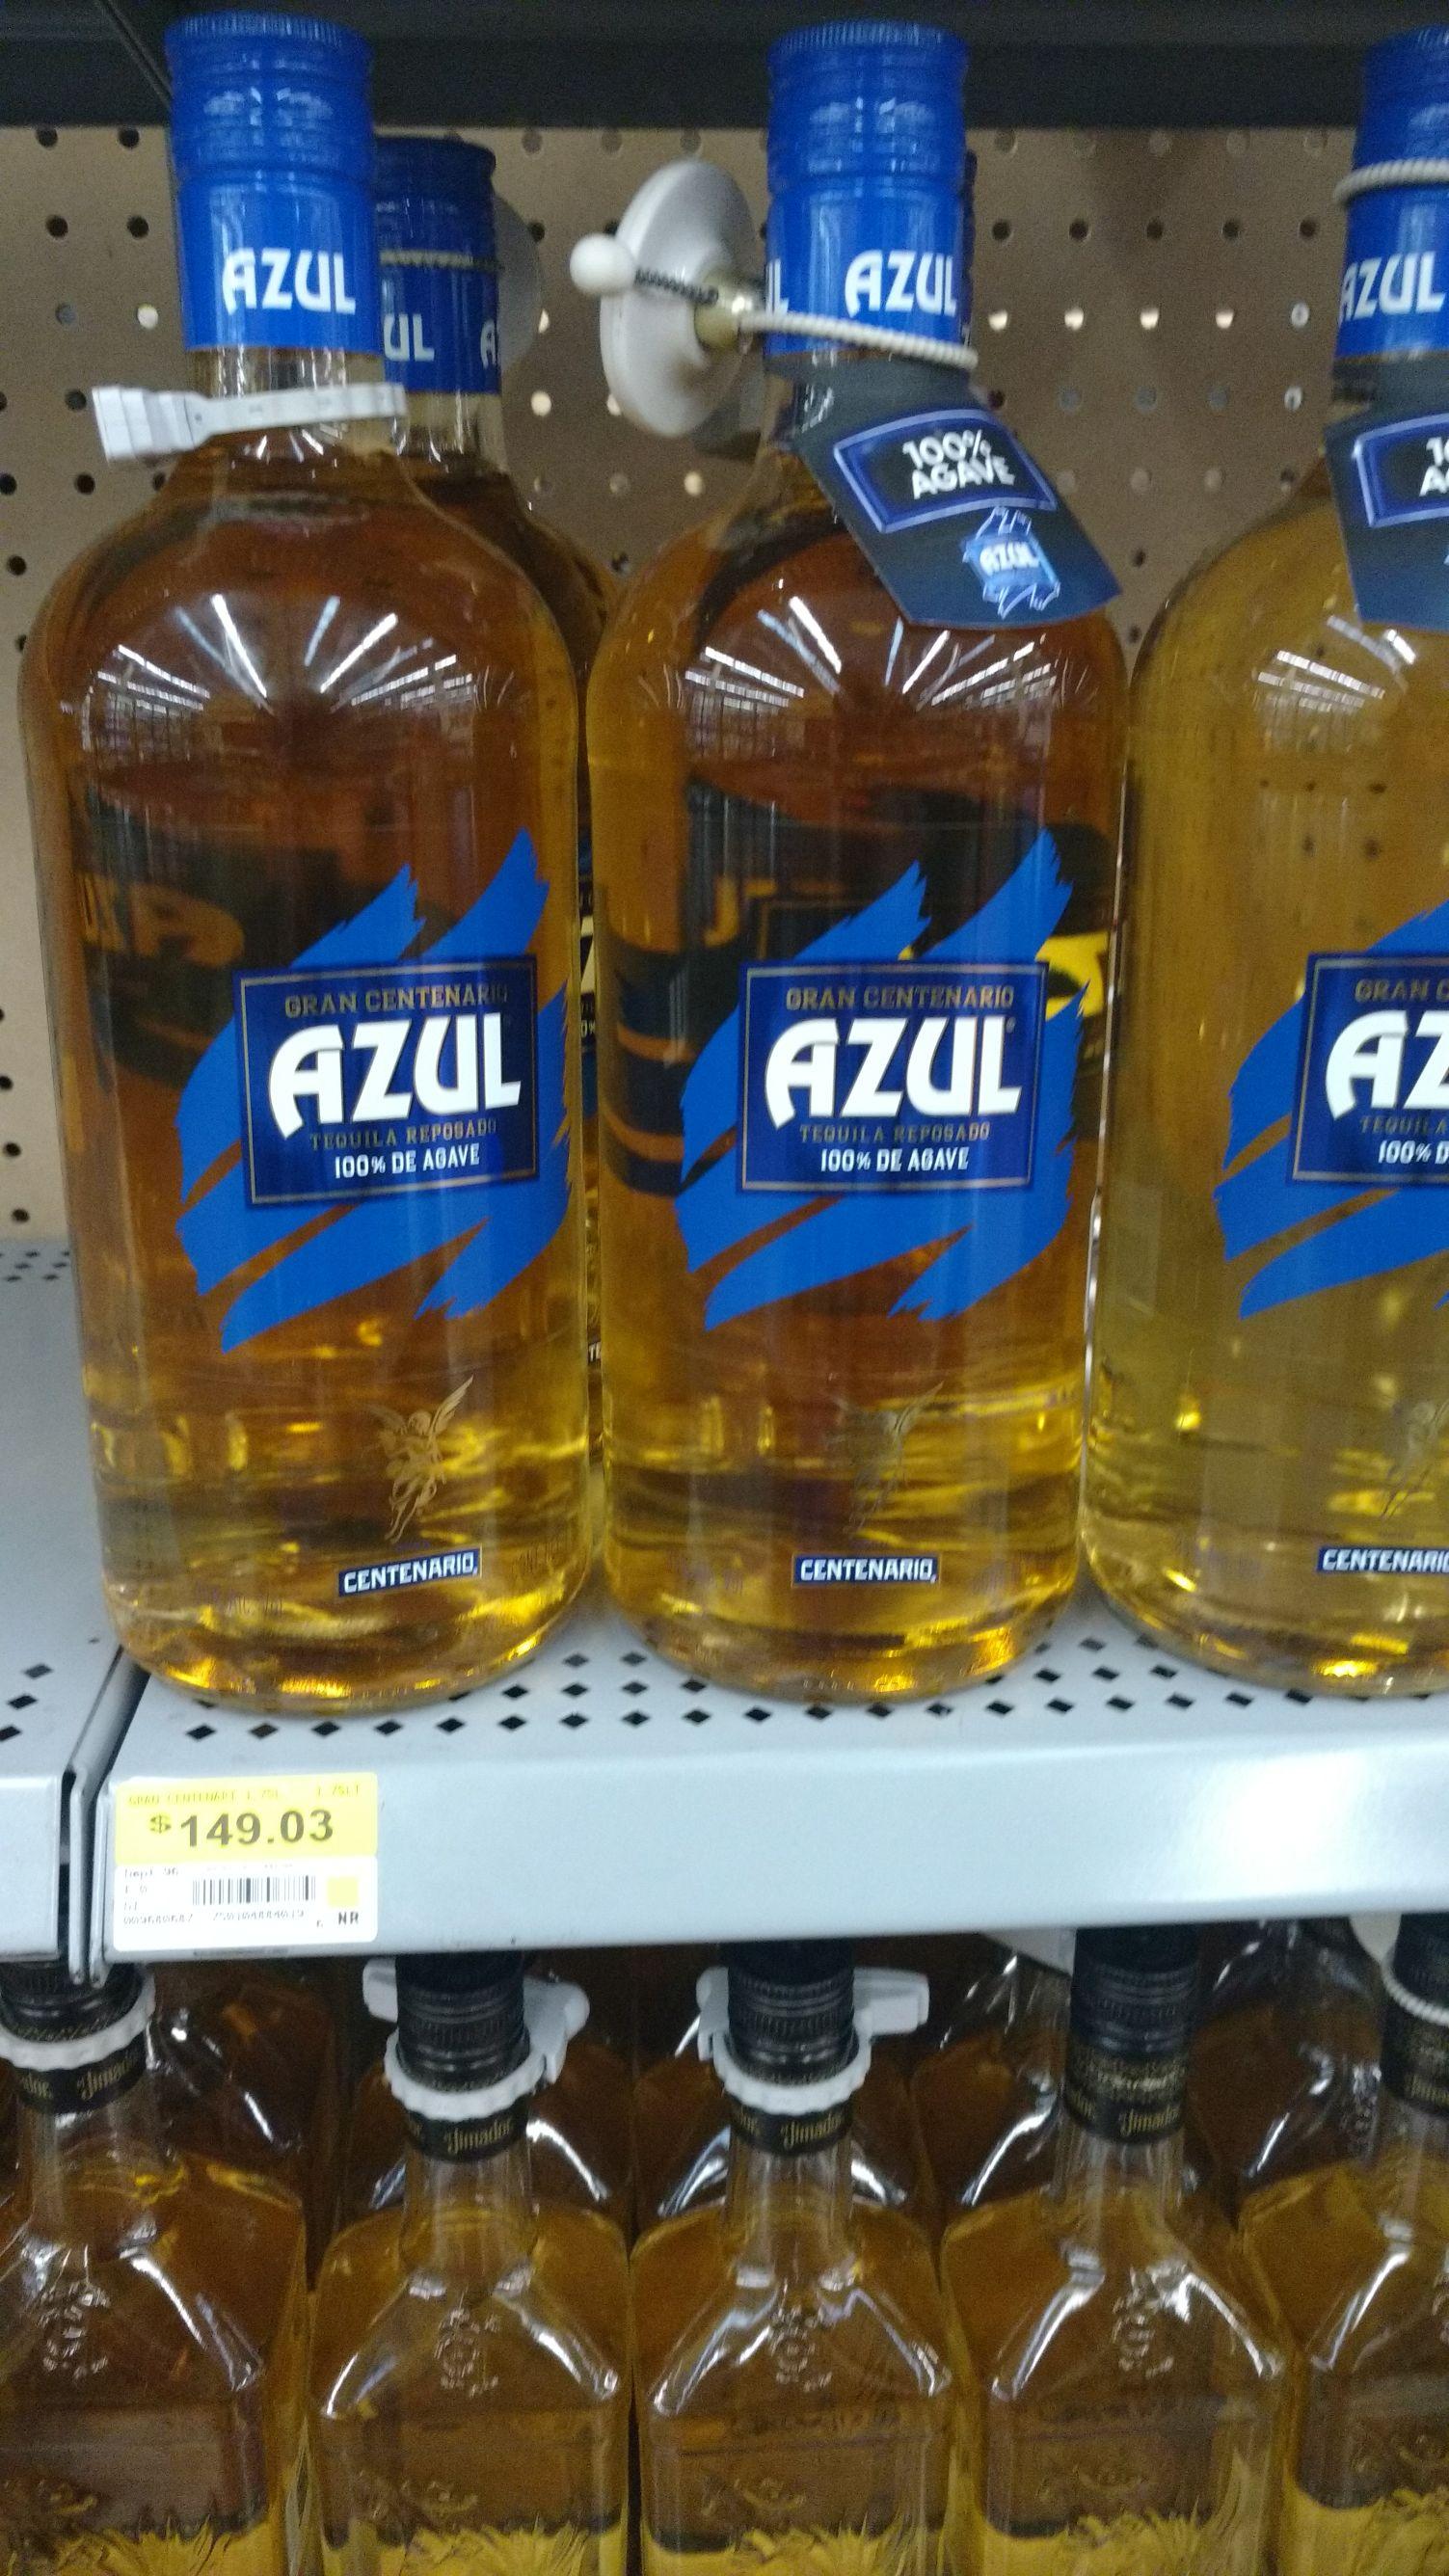 Walmart tecnológico colima: Tequila azul 1.75 lts  $149.03